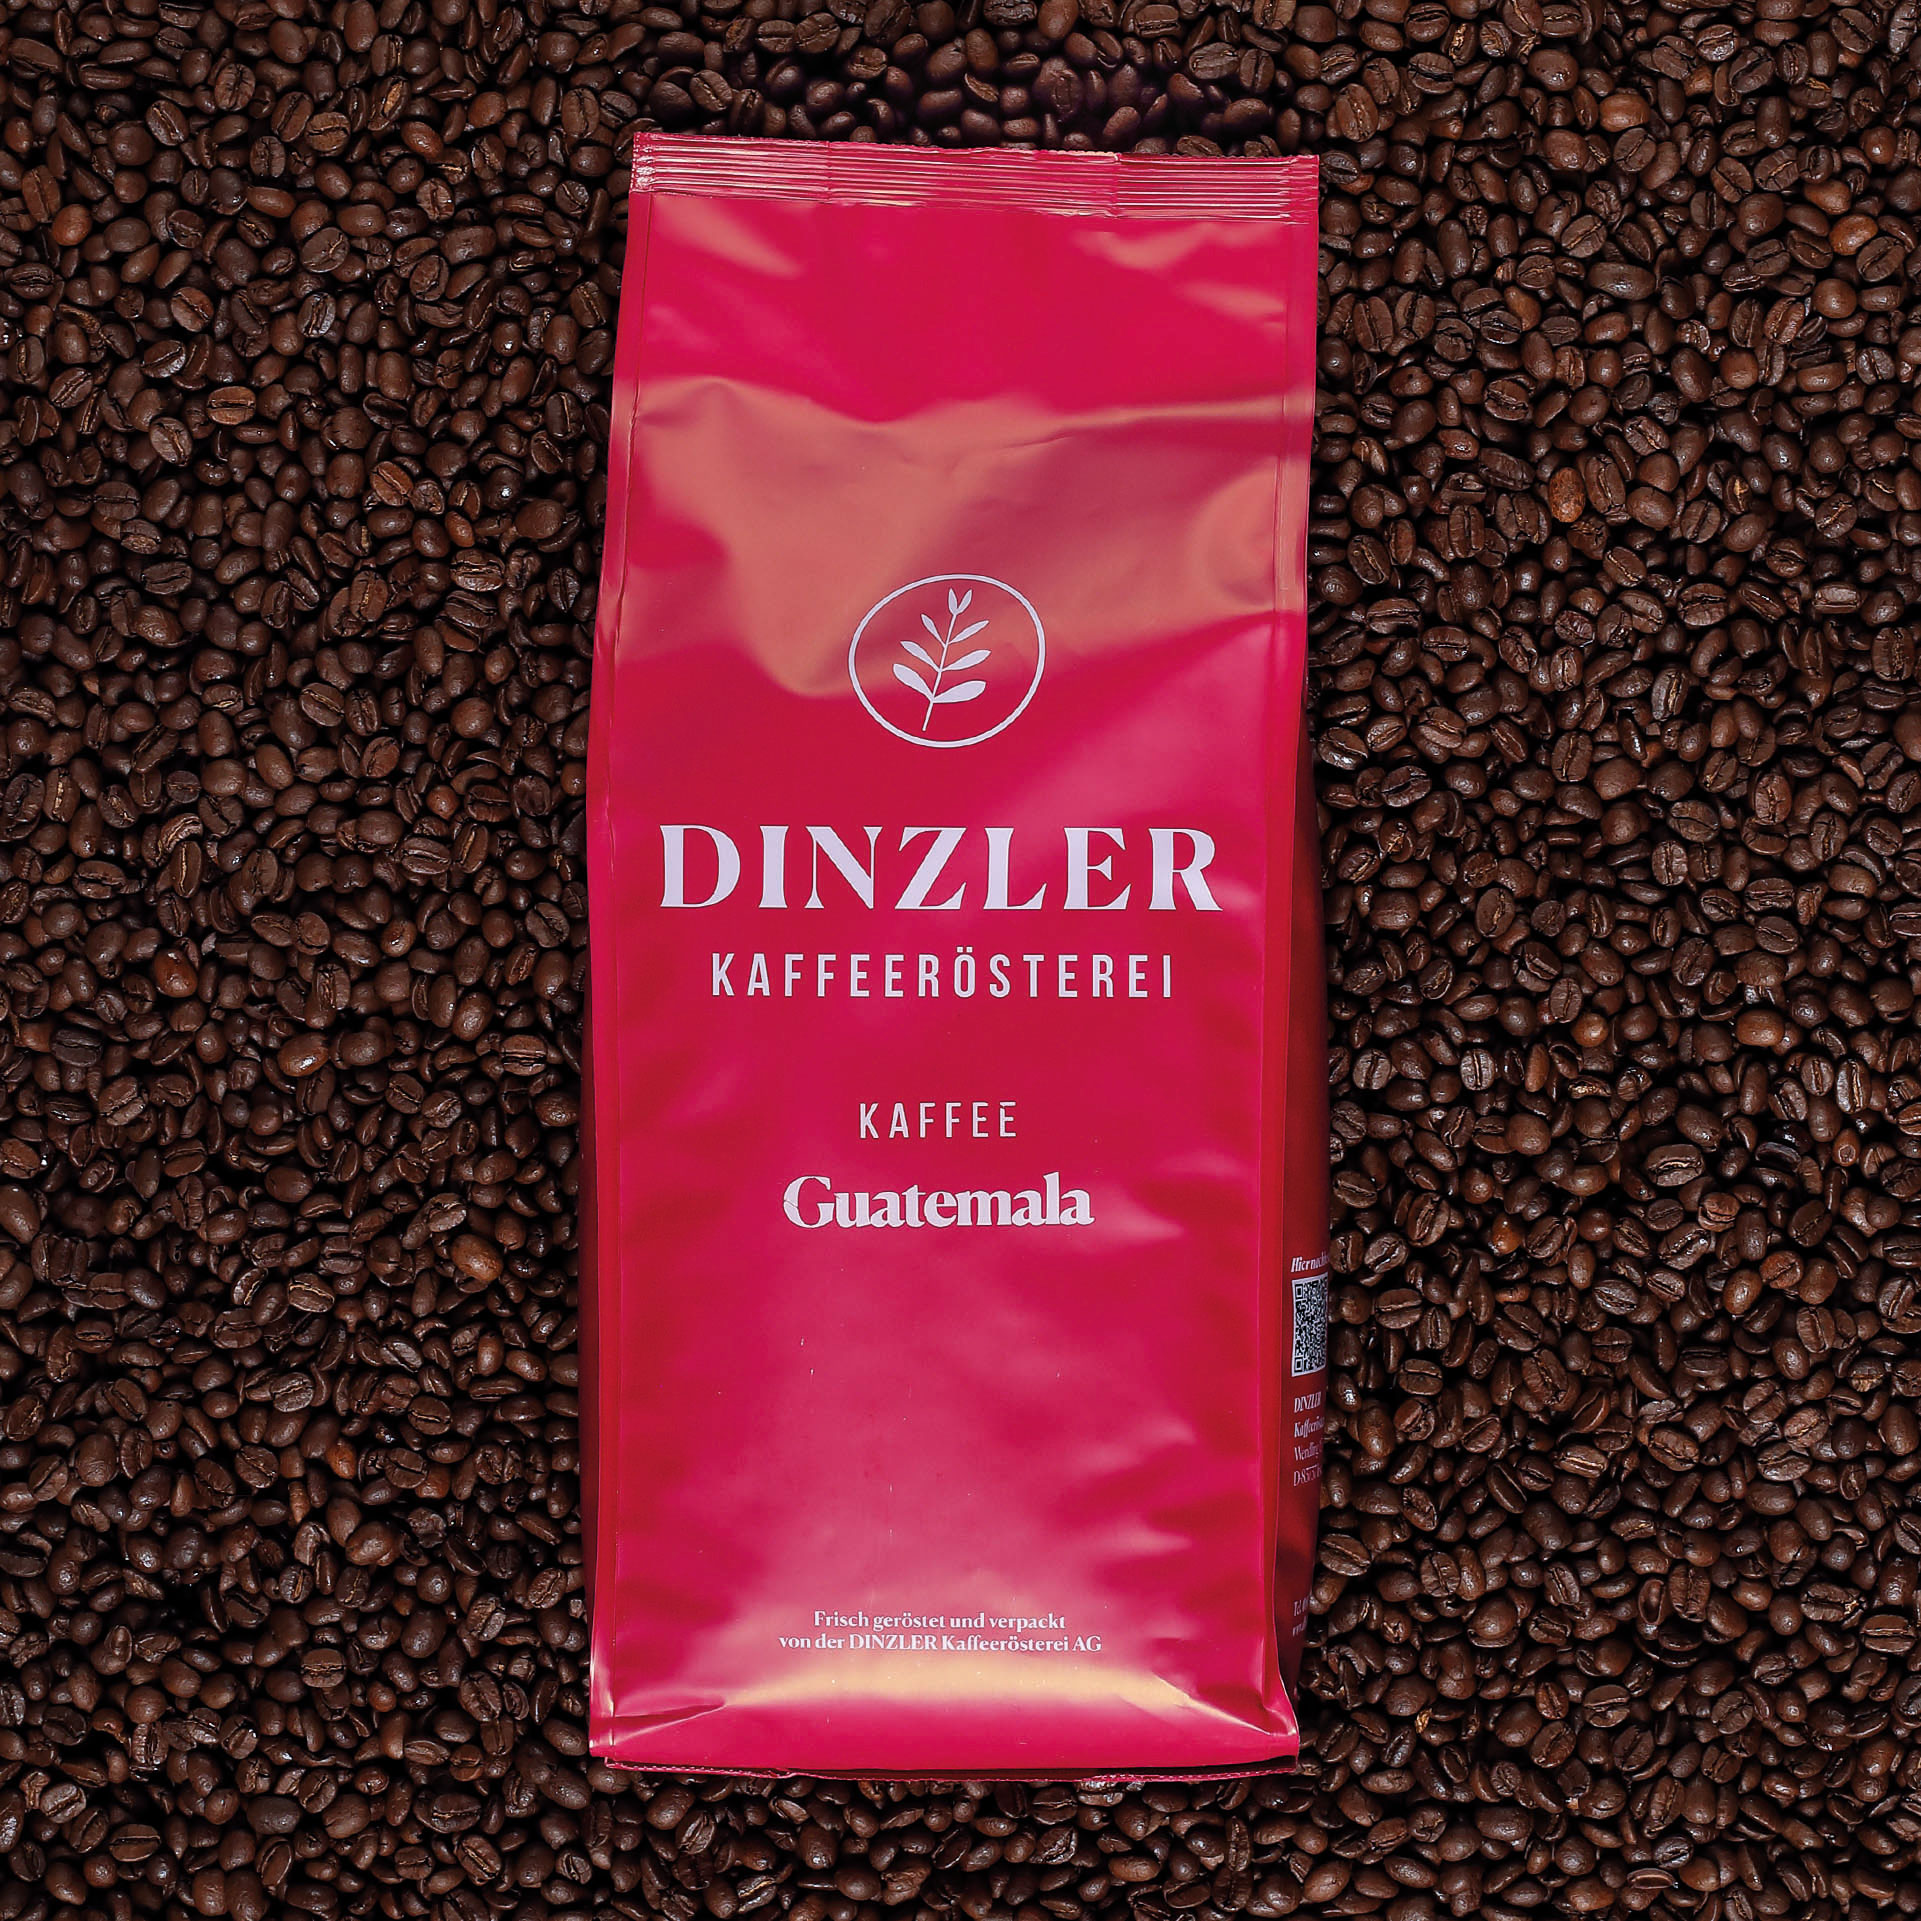 Kaffee Guatemala | DINZLER Shop